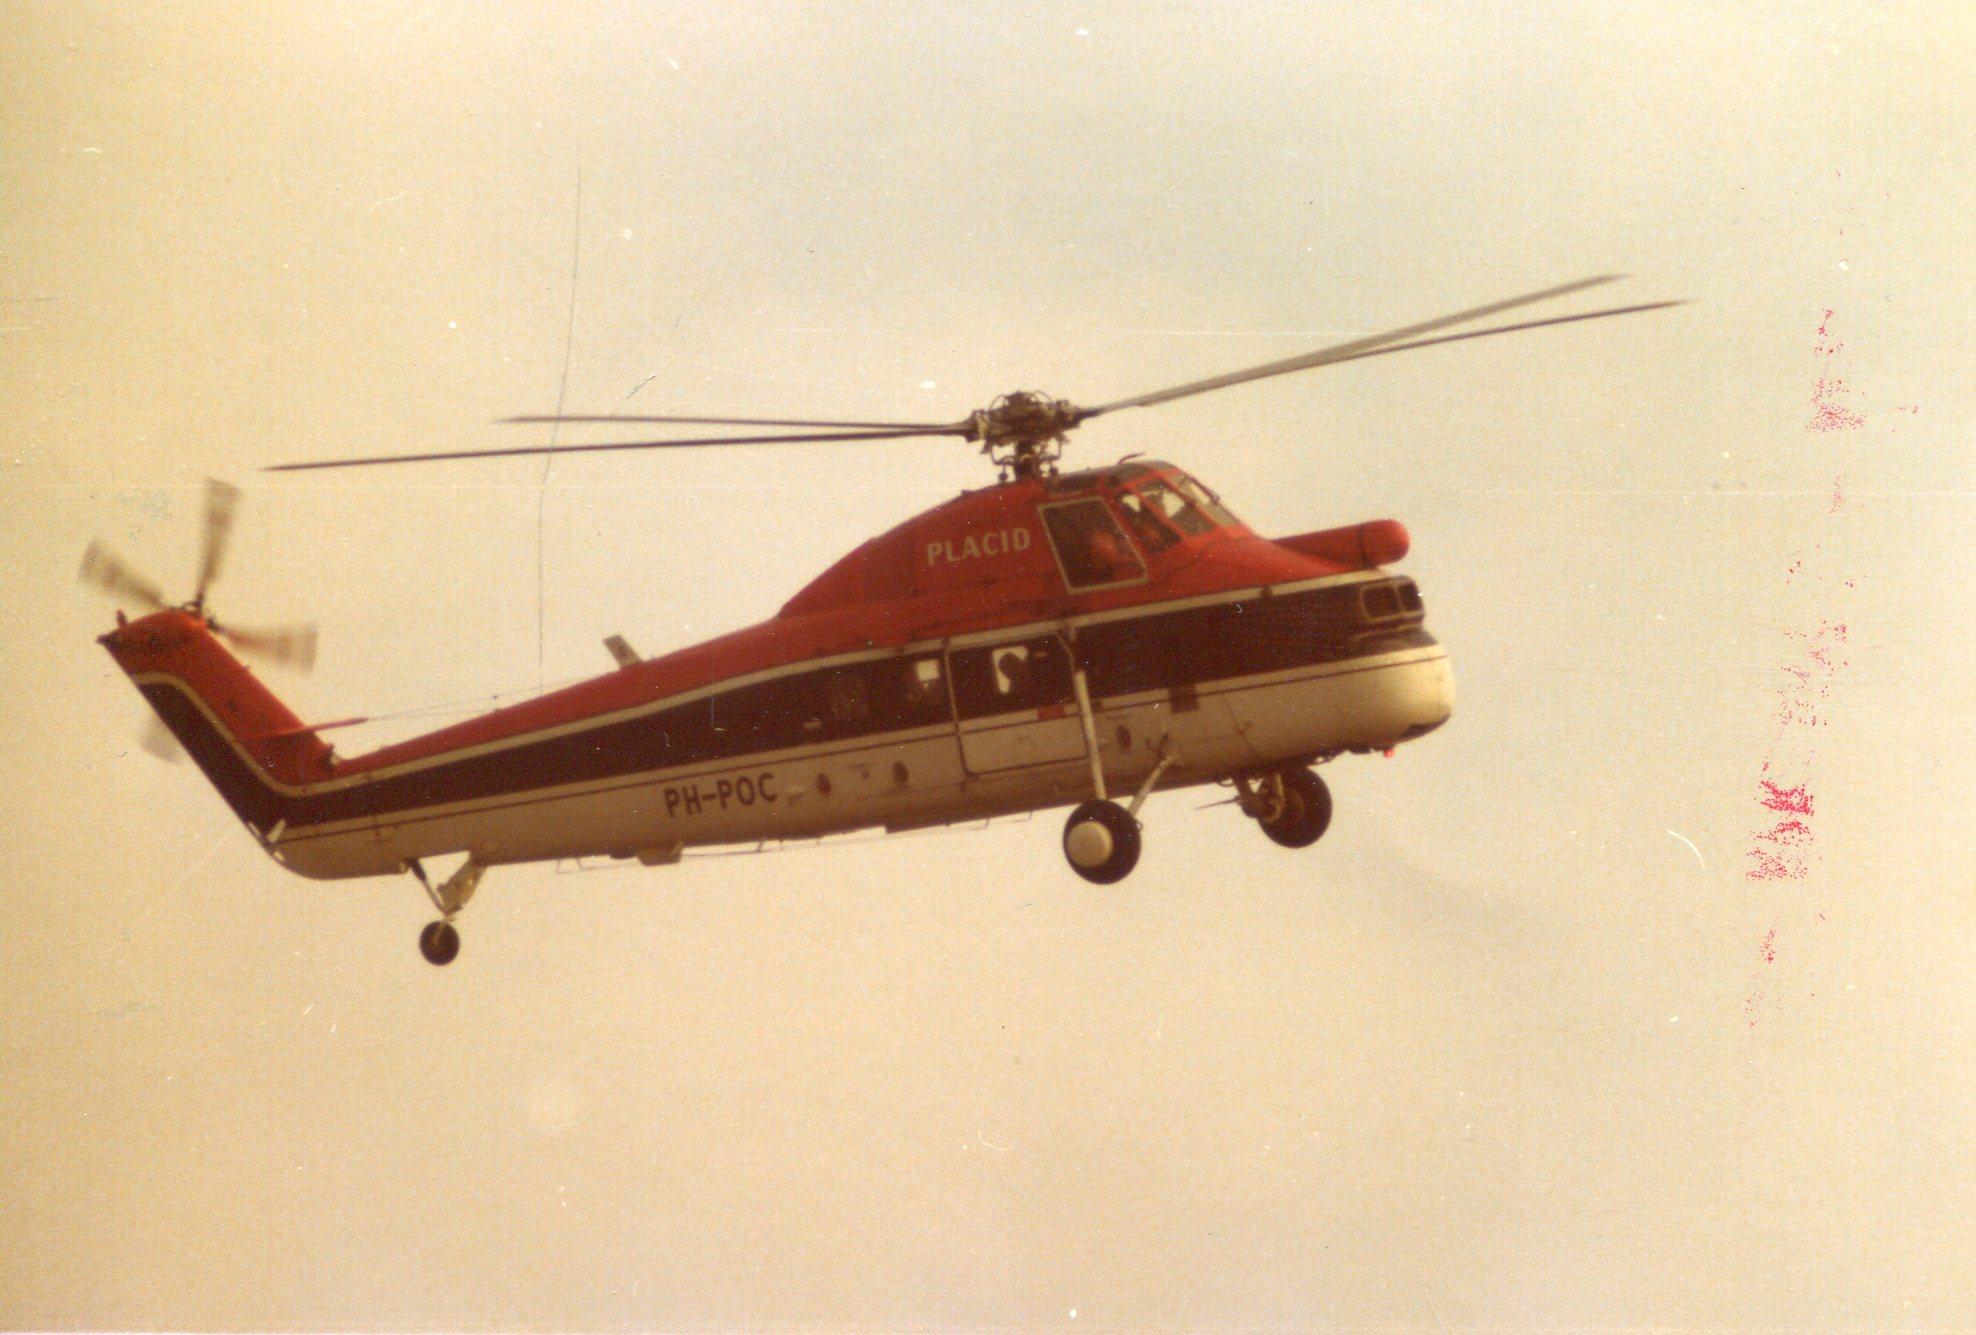 Naam: Den Helder , april 1977 (3).jpg Bekeken: 475 Grootte: 334,4 KB